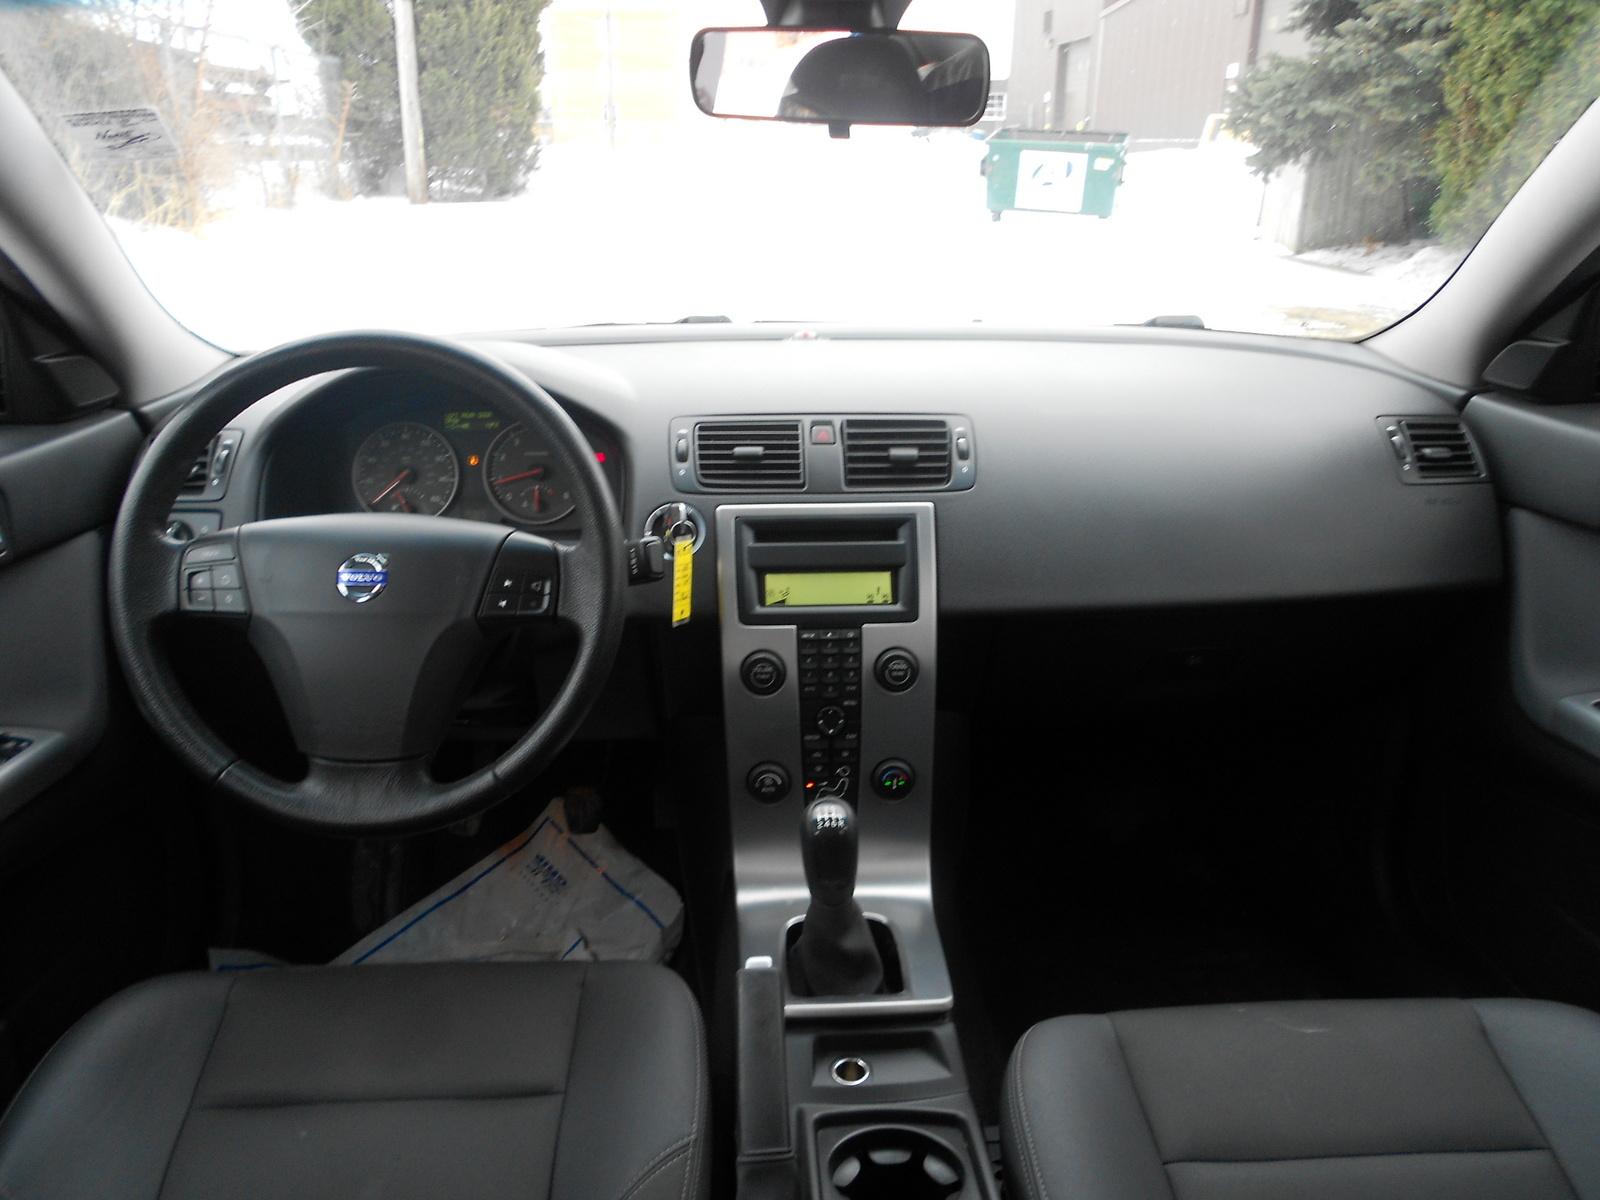 Volvo S T Awd Pic on 2000 Volvo S70 Interior